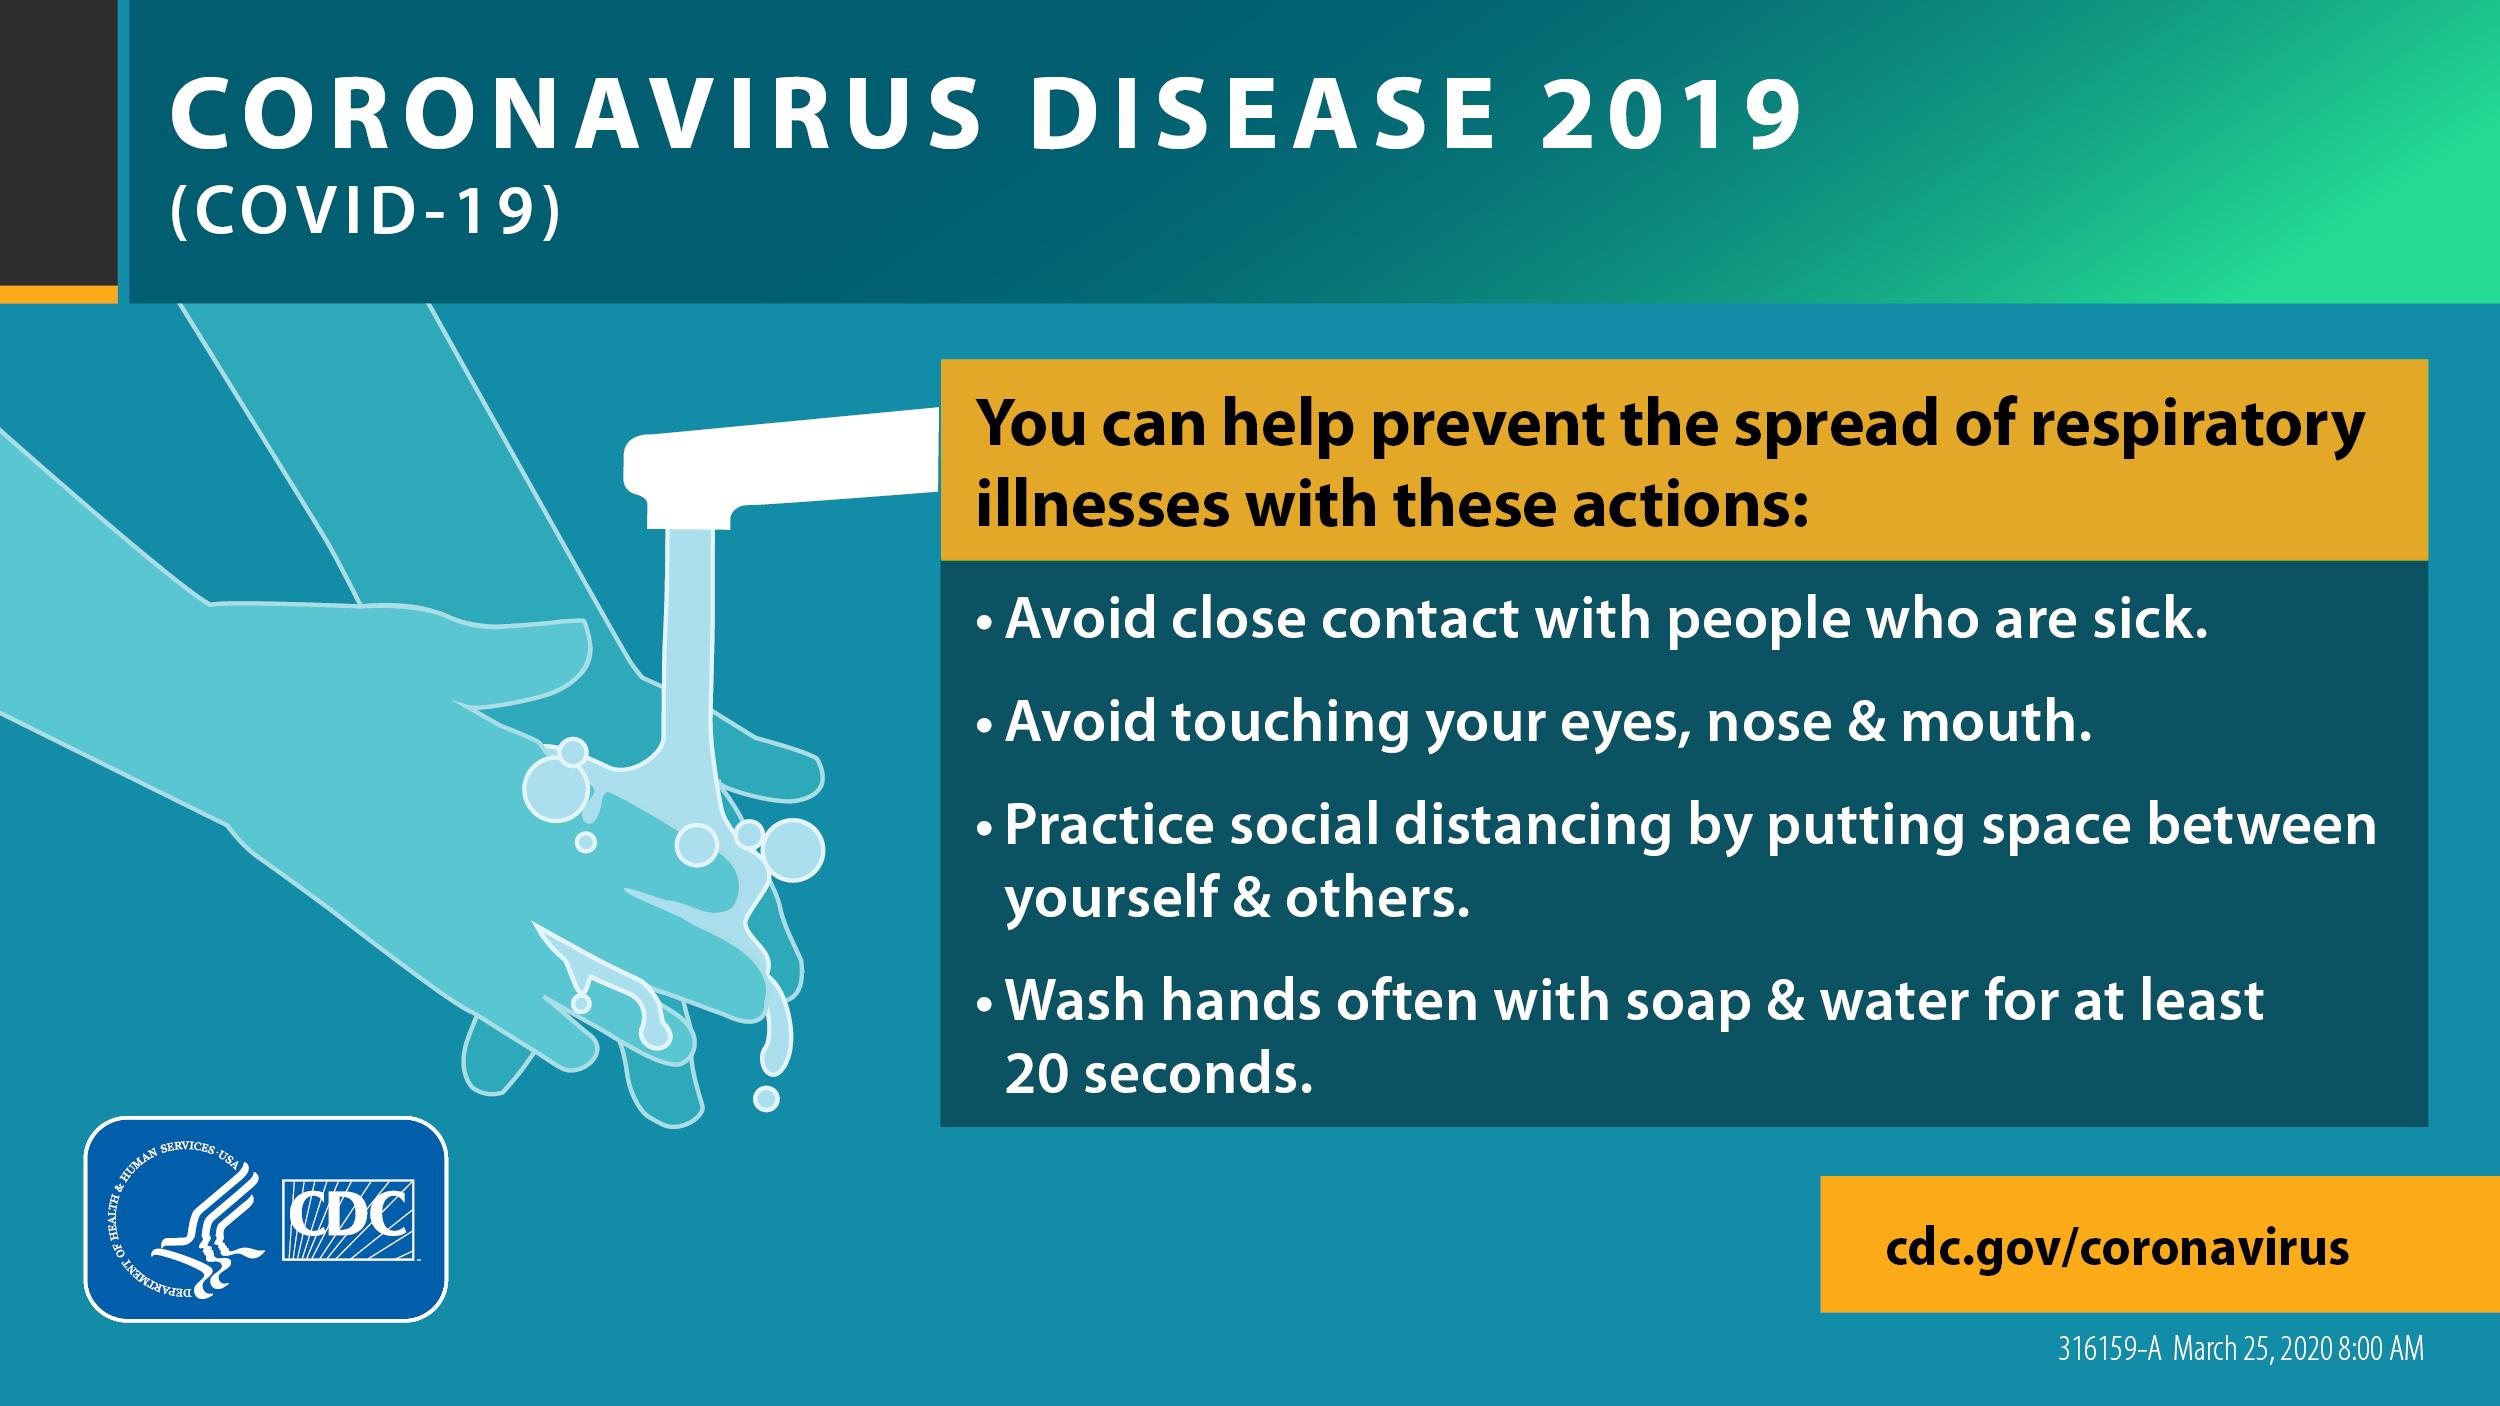 prevent illness spread graphic from cdc